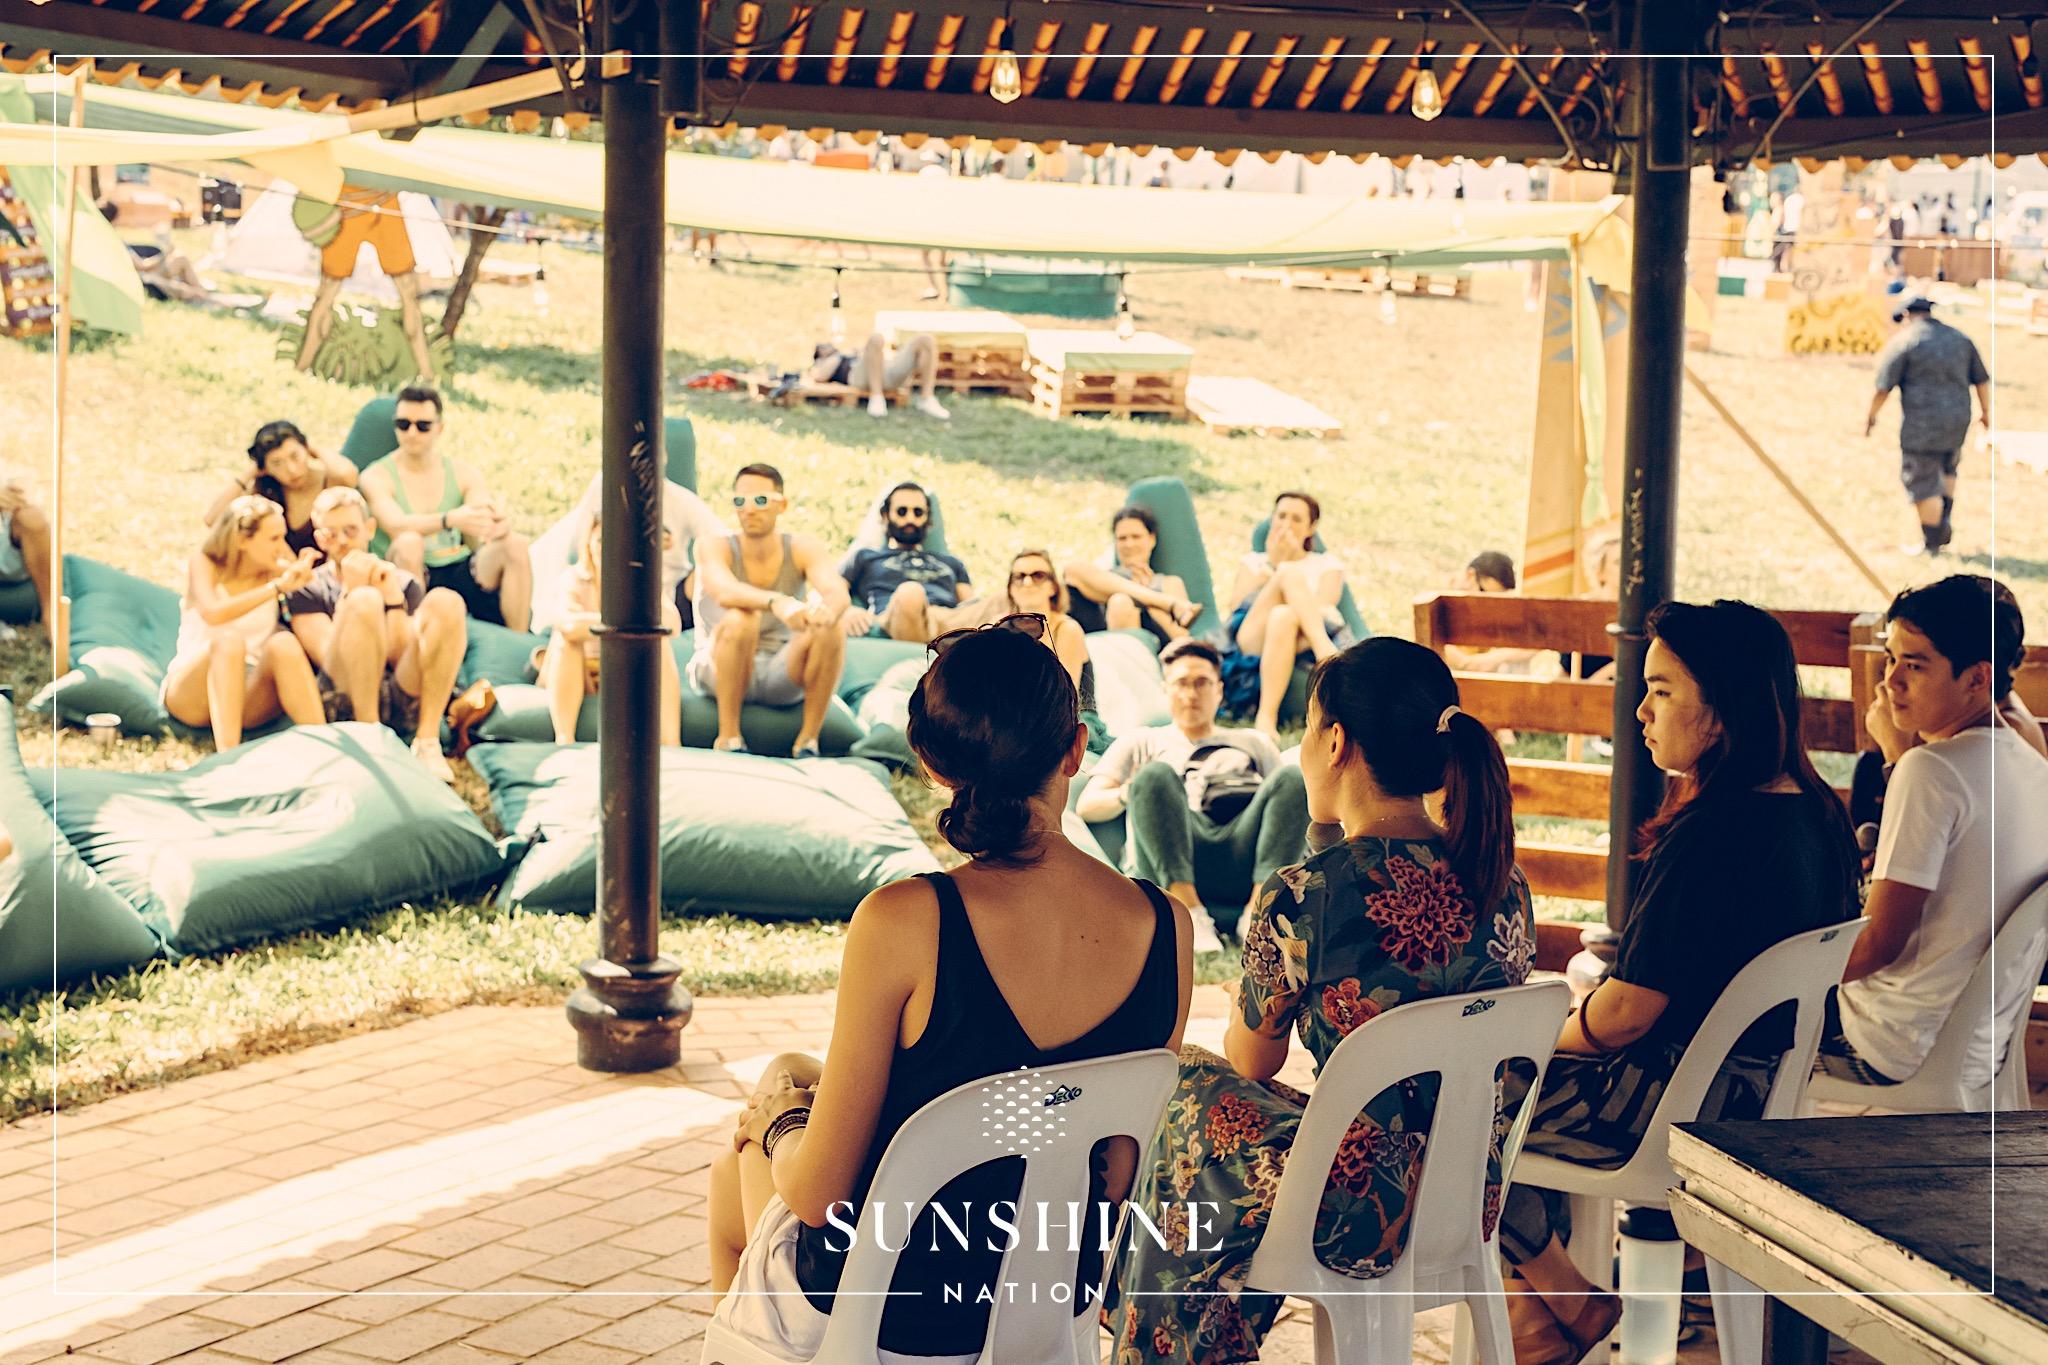 09032019_SunshineNation_Colossal168_Watermarked.jpg